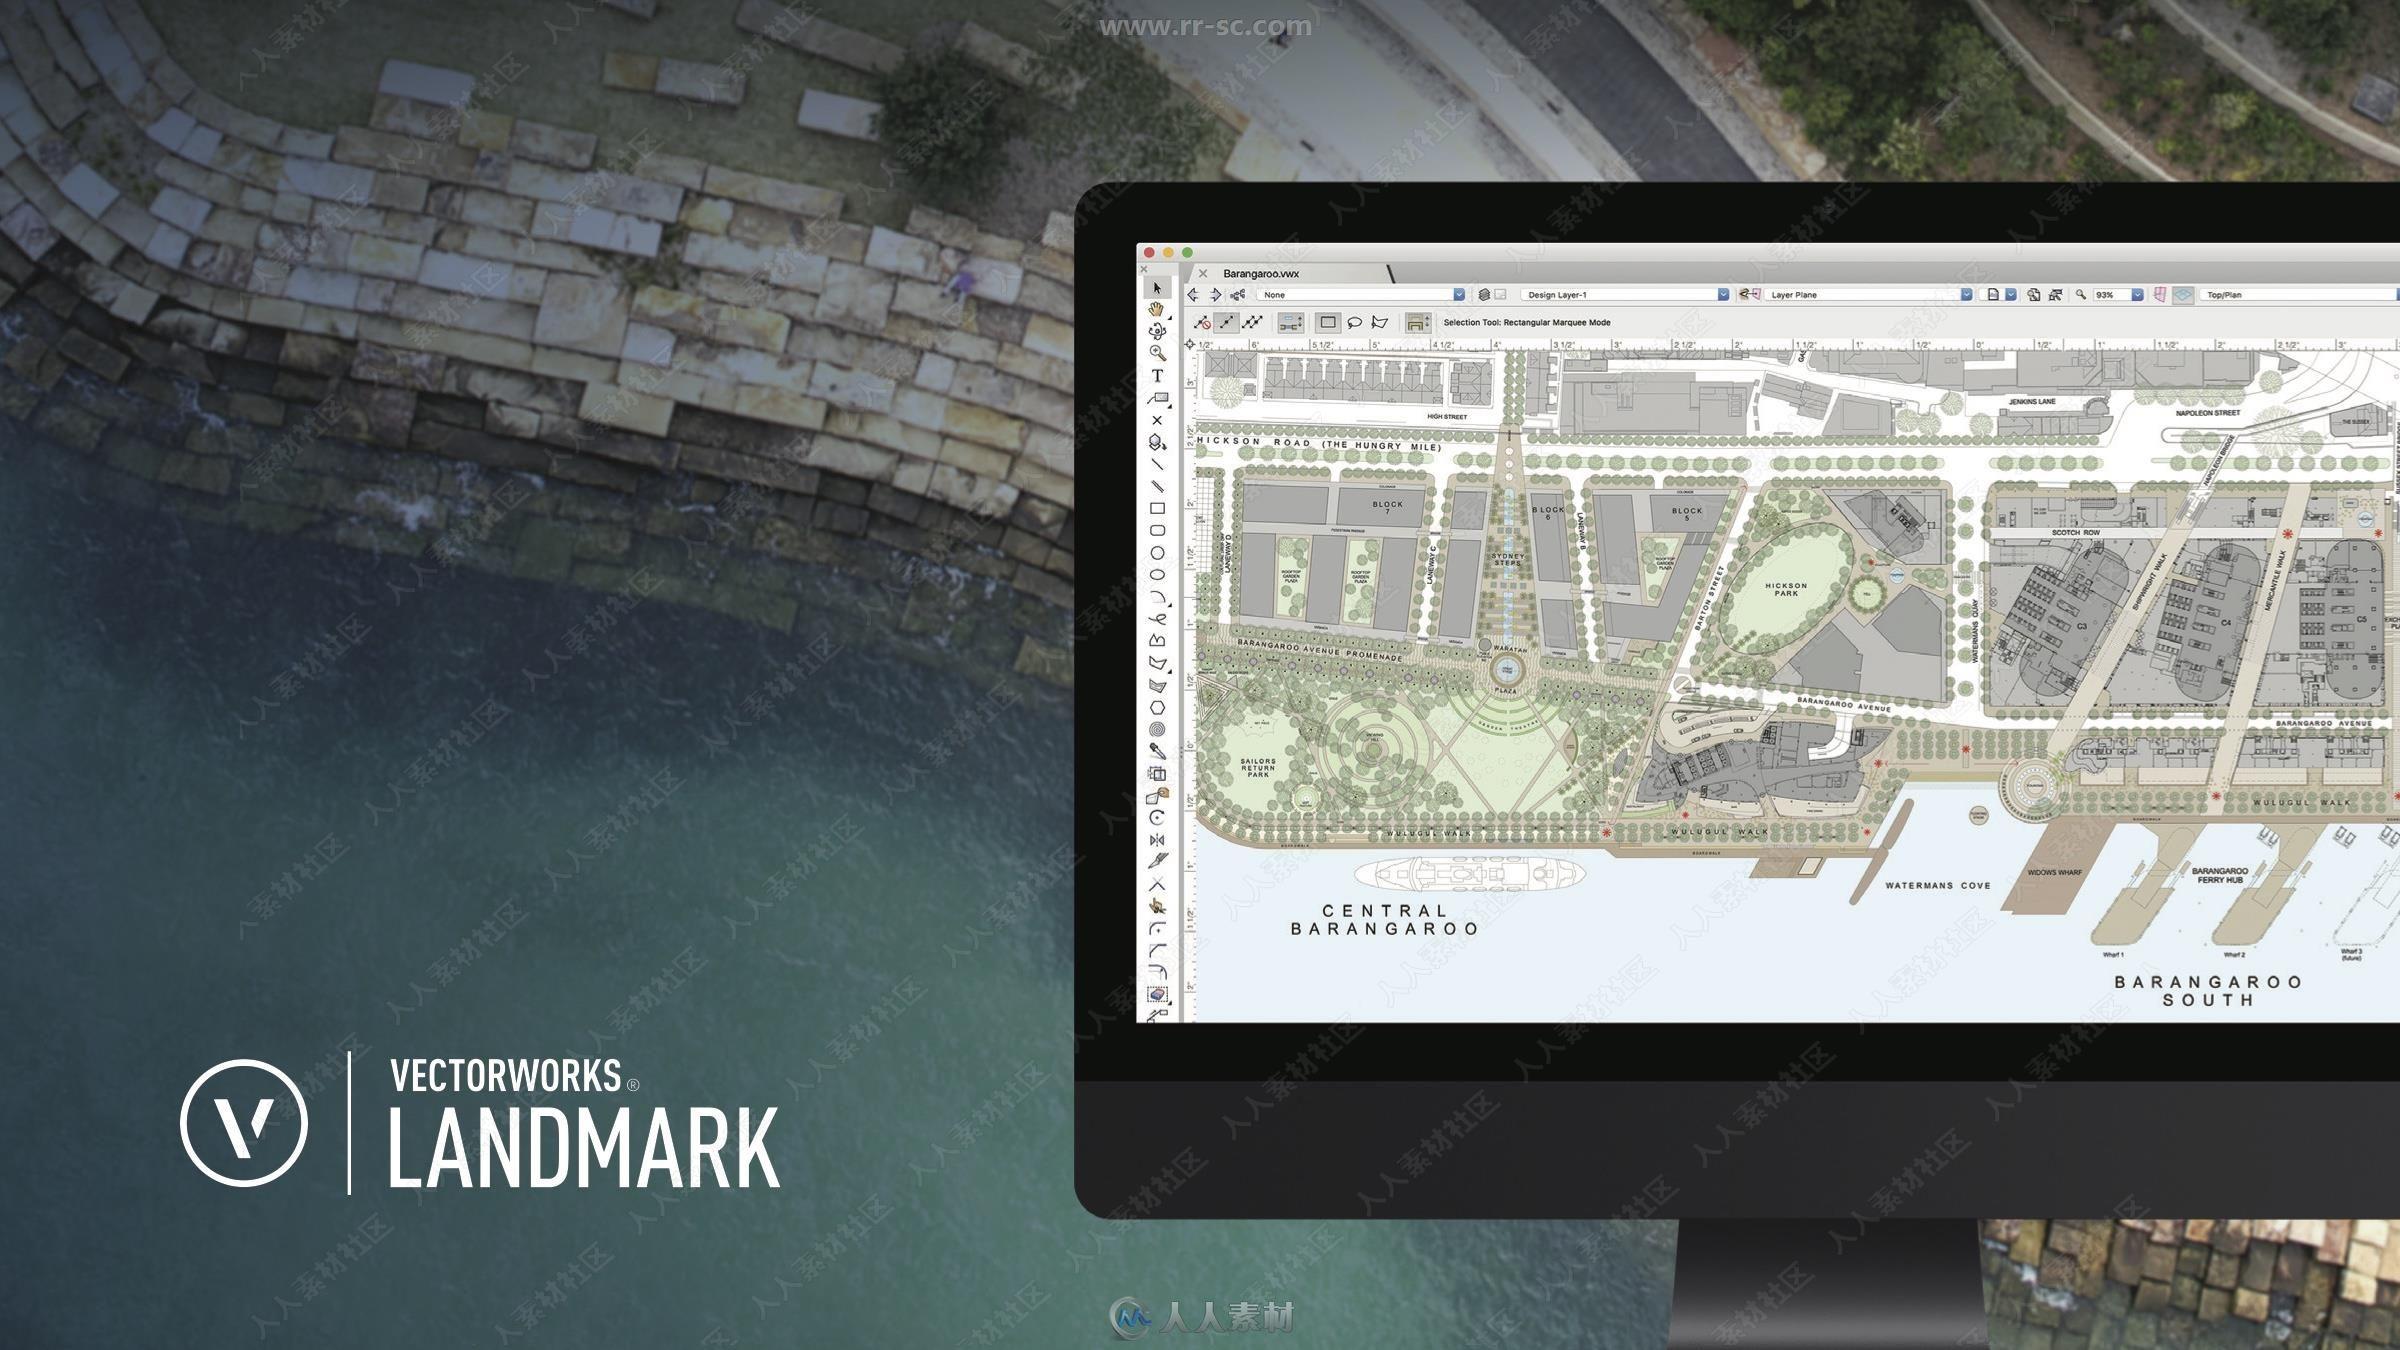 Vectorworks interiorcad 2020建筑与工业设计软件SP3.1版83 / 作者:抱着猫的老鼠 / 帖子ID:16762255,6527865